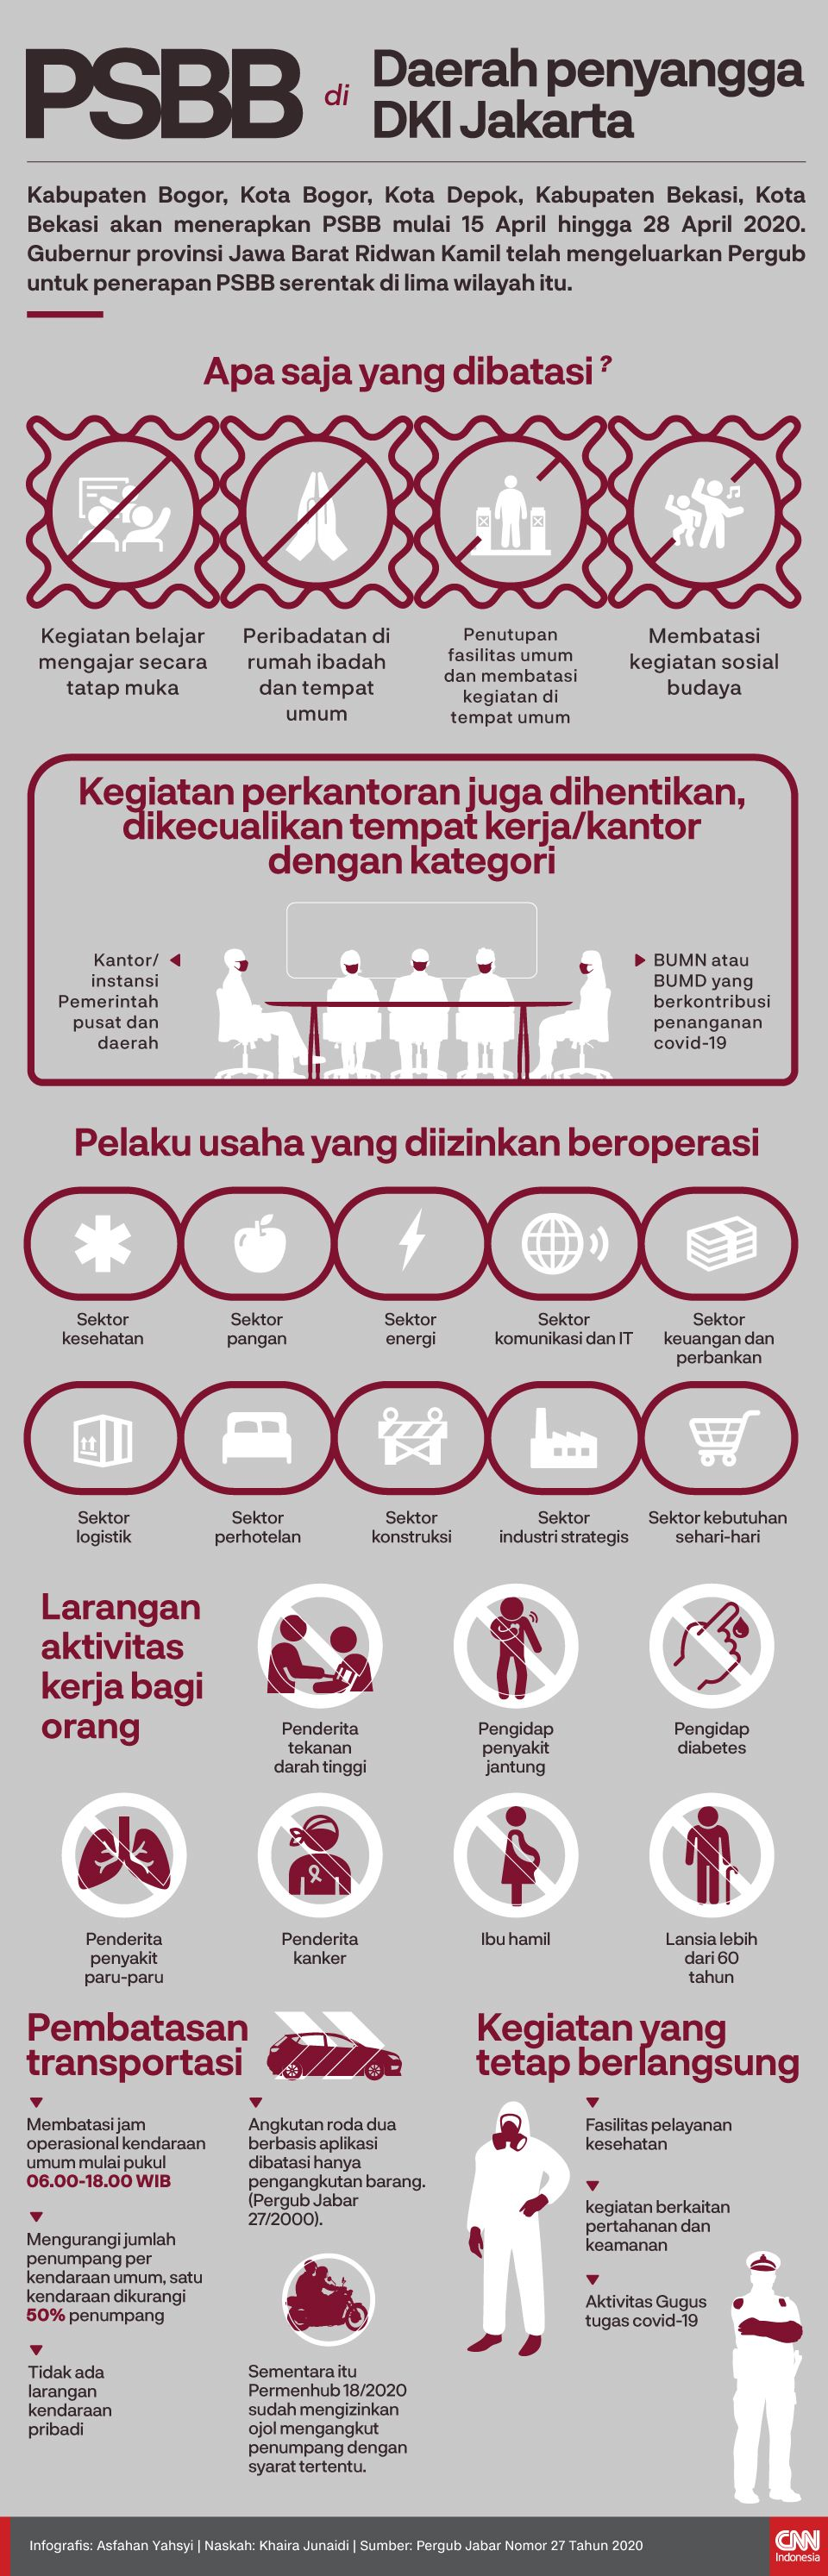 Infografis PSBB di Daerah penyangga DKI Jakarta